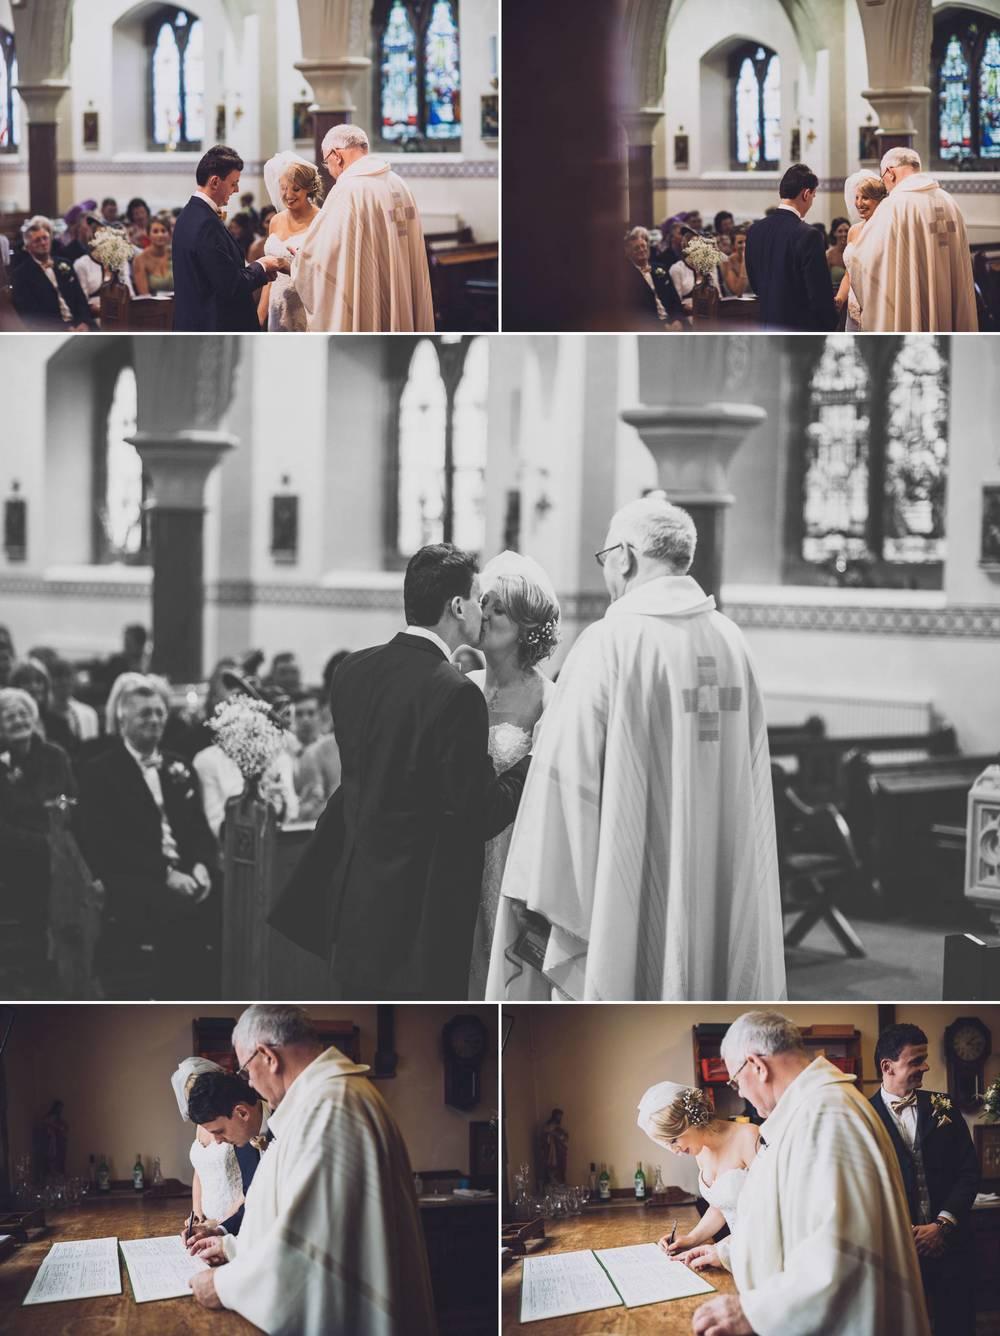 wedding-photographer-staffordshire 9.jpg